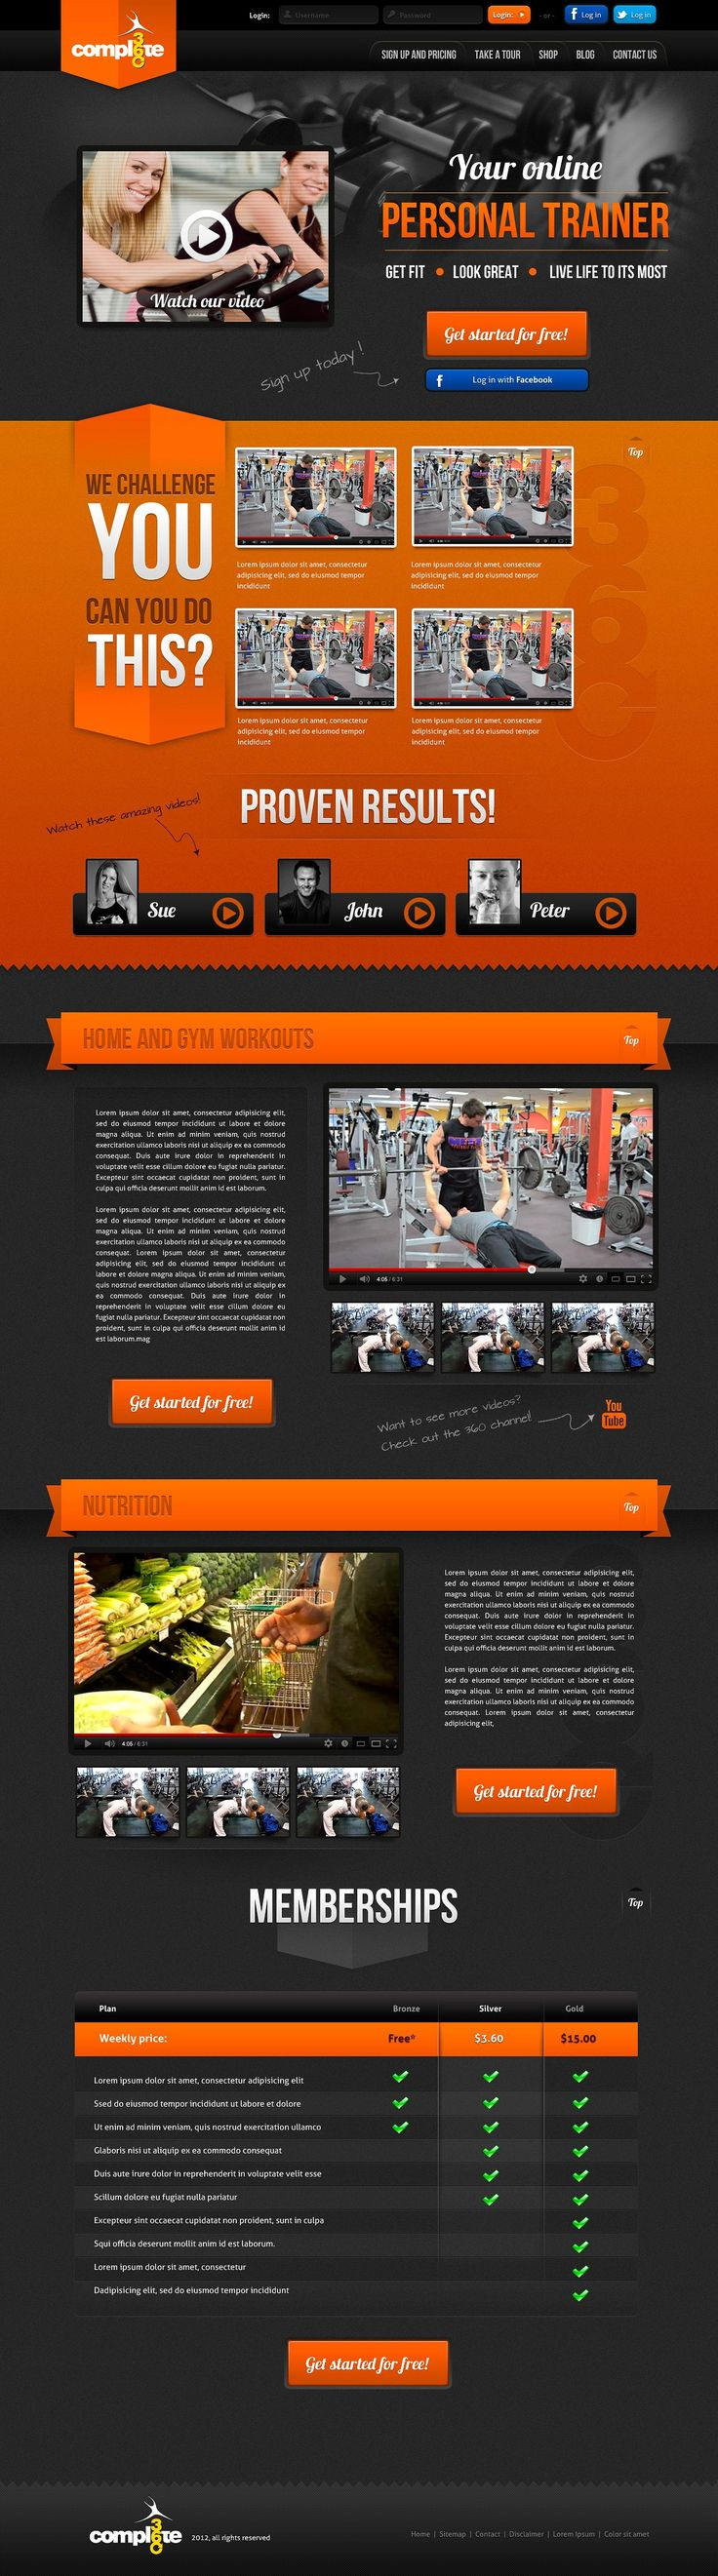 Complete 360 - Fitness UI Design by shresthasans on @creativemarket